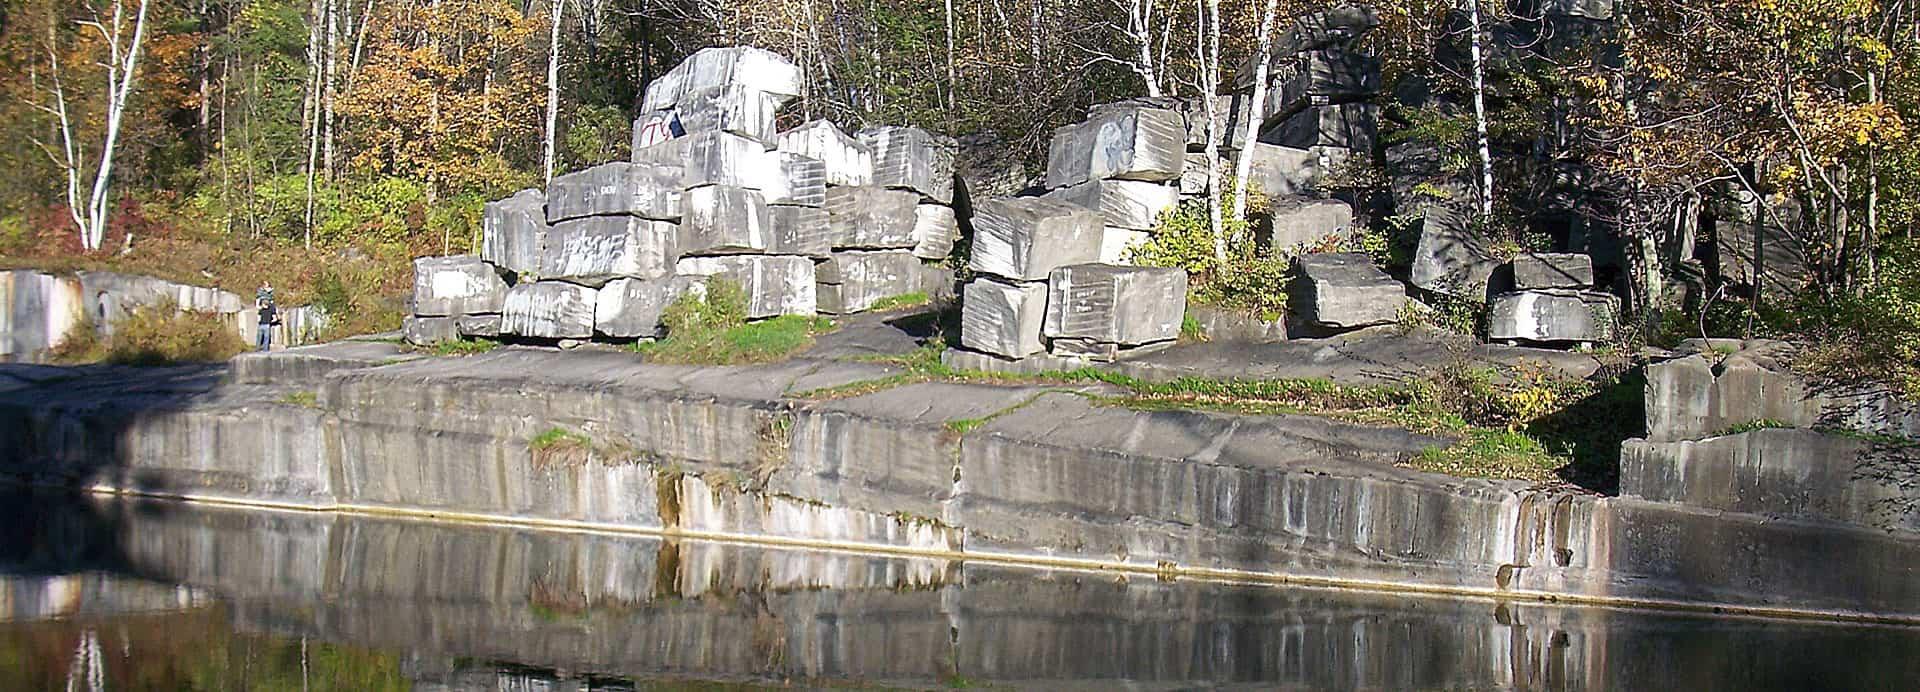 Dorset Quarry